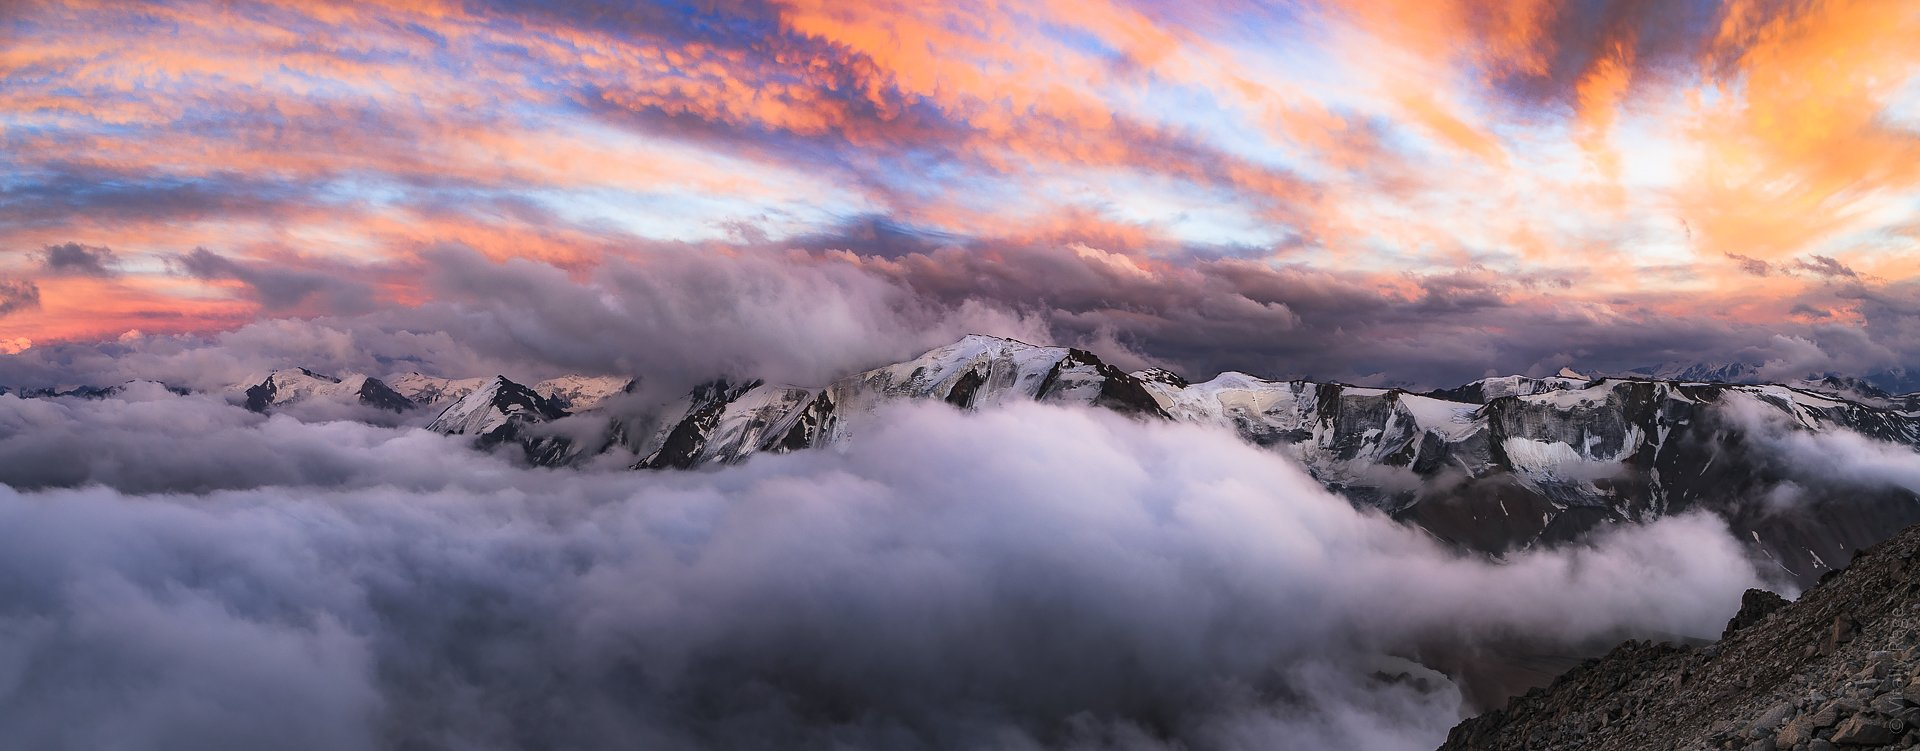 горы, казахстан, алматы, заилийский алатау, Vitaliy Rage